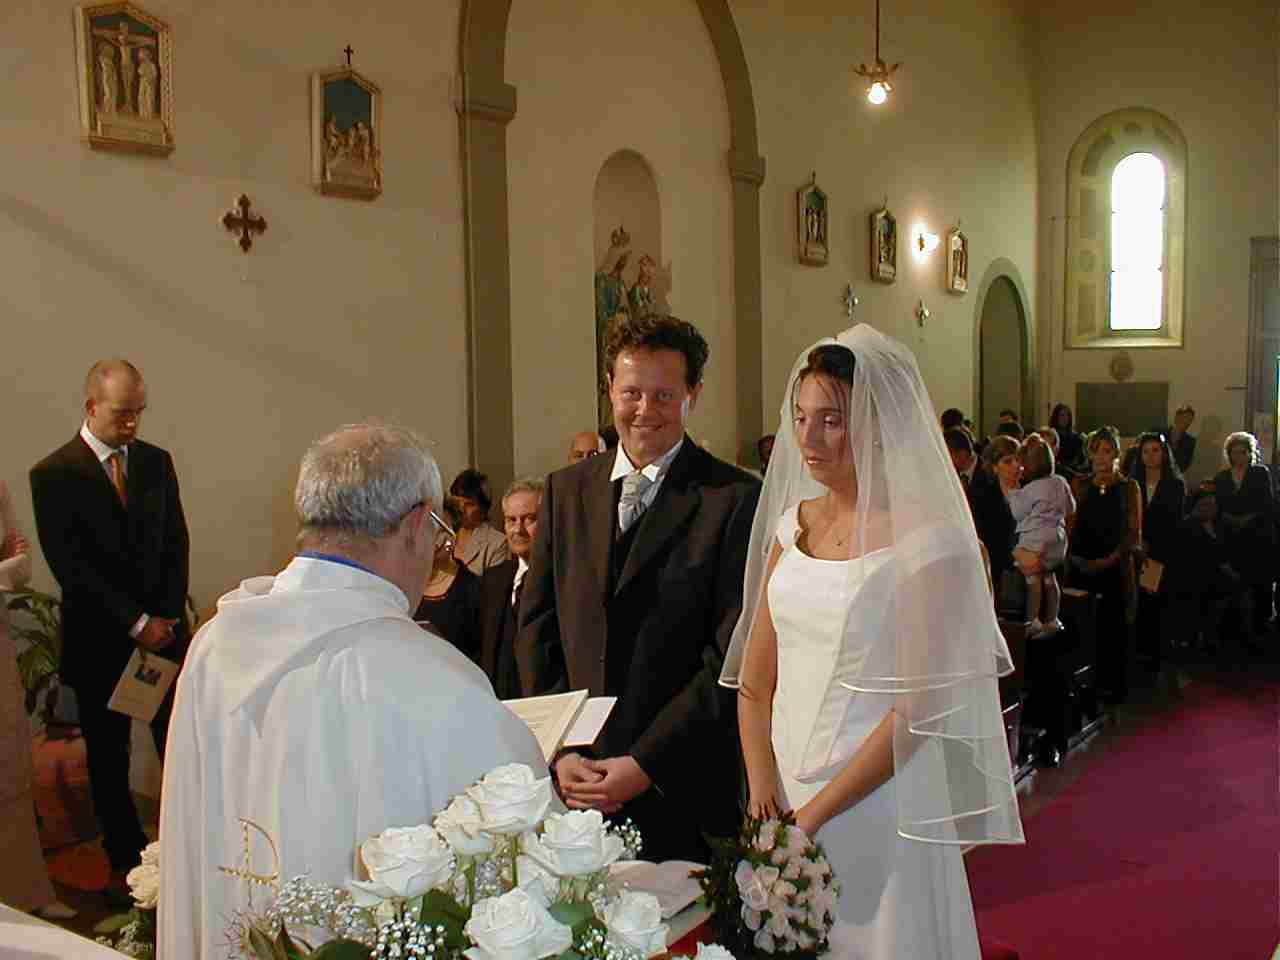 Matrimonio In Chiesa : Irlanda nel aumentano i matrimoni in chiesa uccr